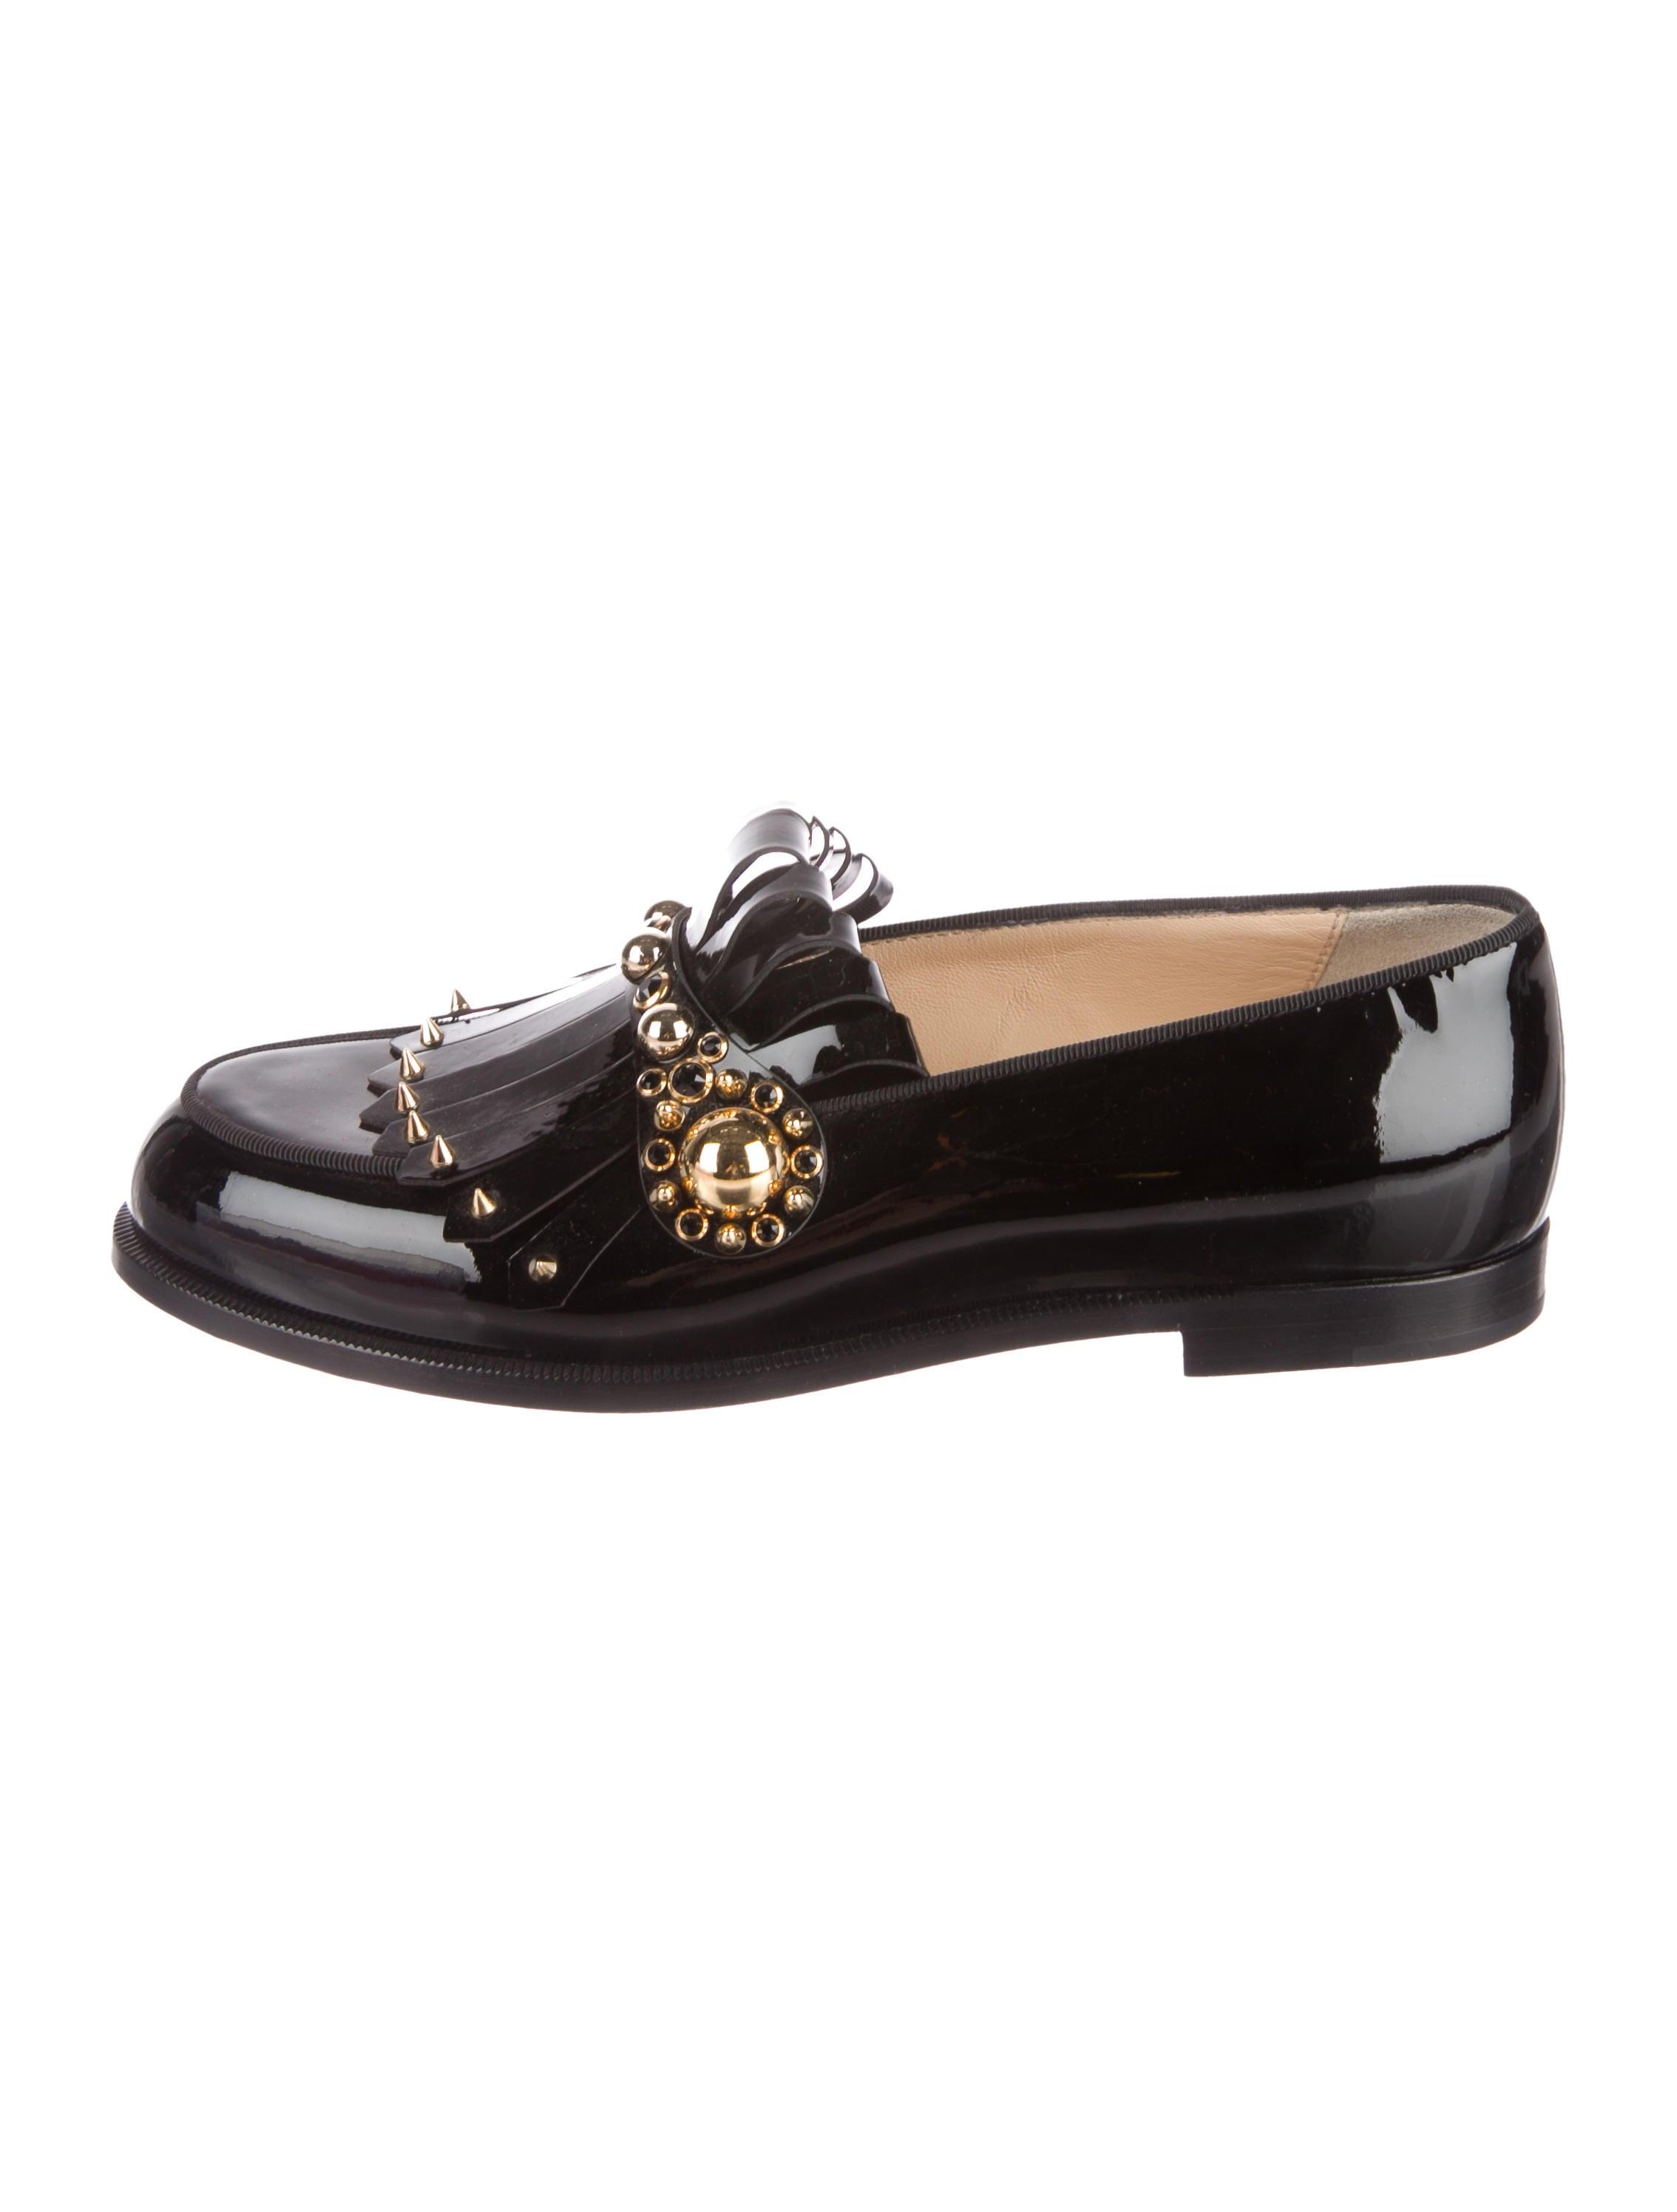 Christian Louboutin 2017 Octavian Patent Leather Loafers largest supplier sale online Ue9jU8sUD